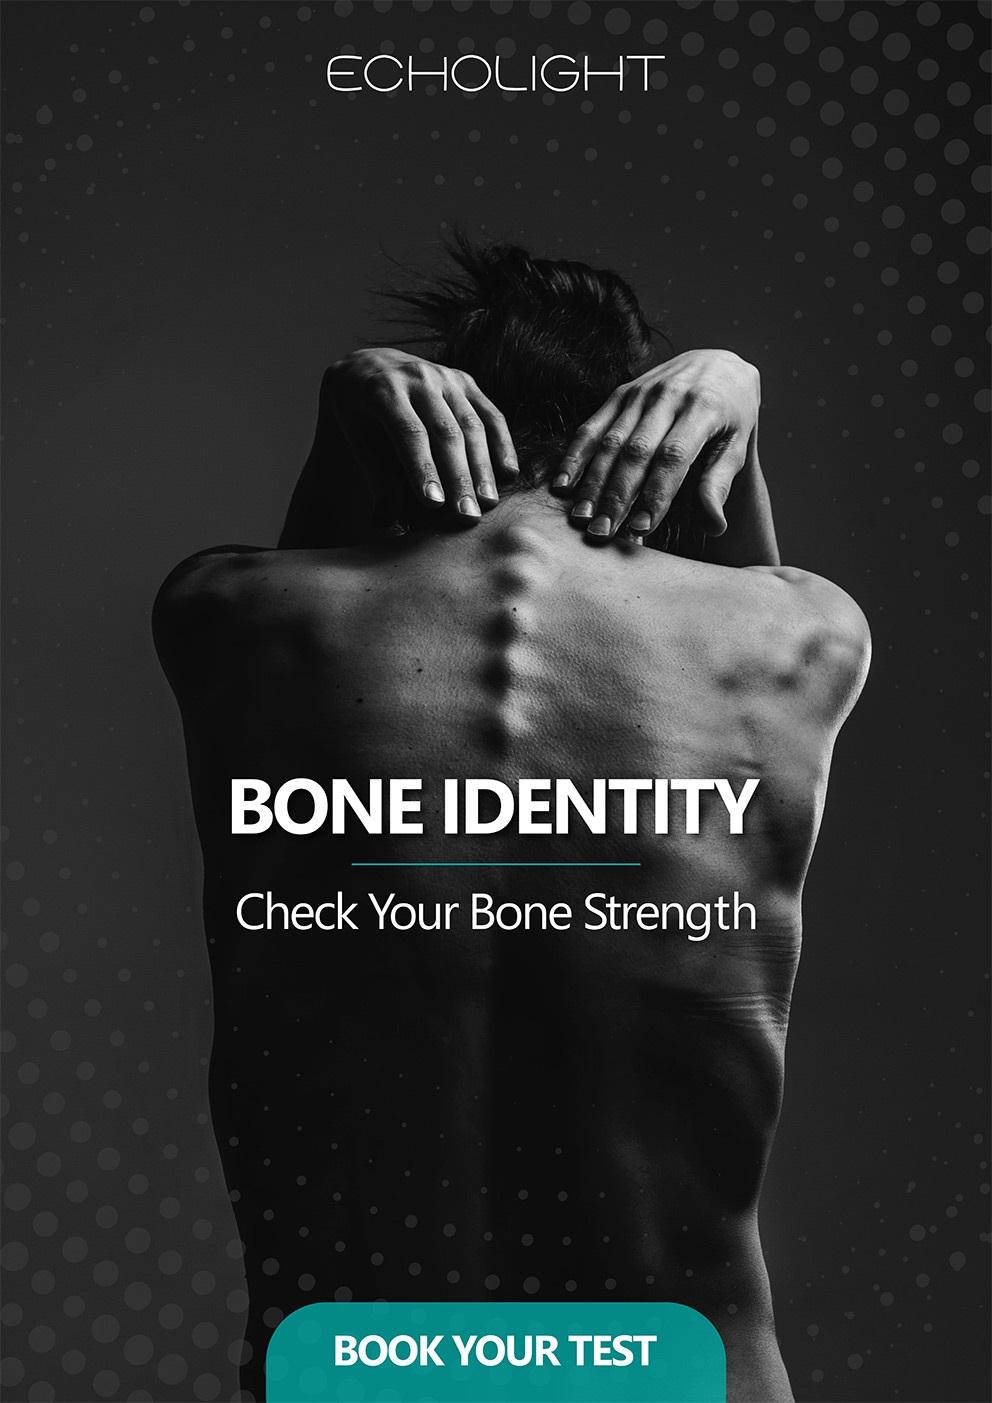 Check Your Bone Strength